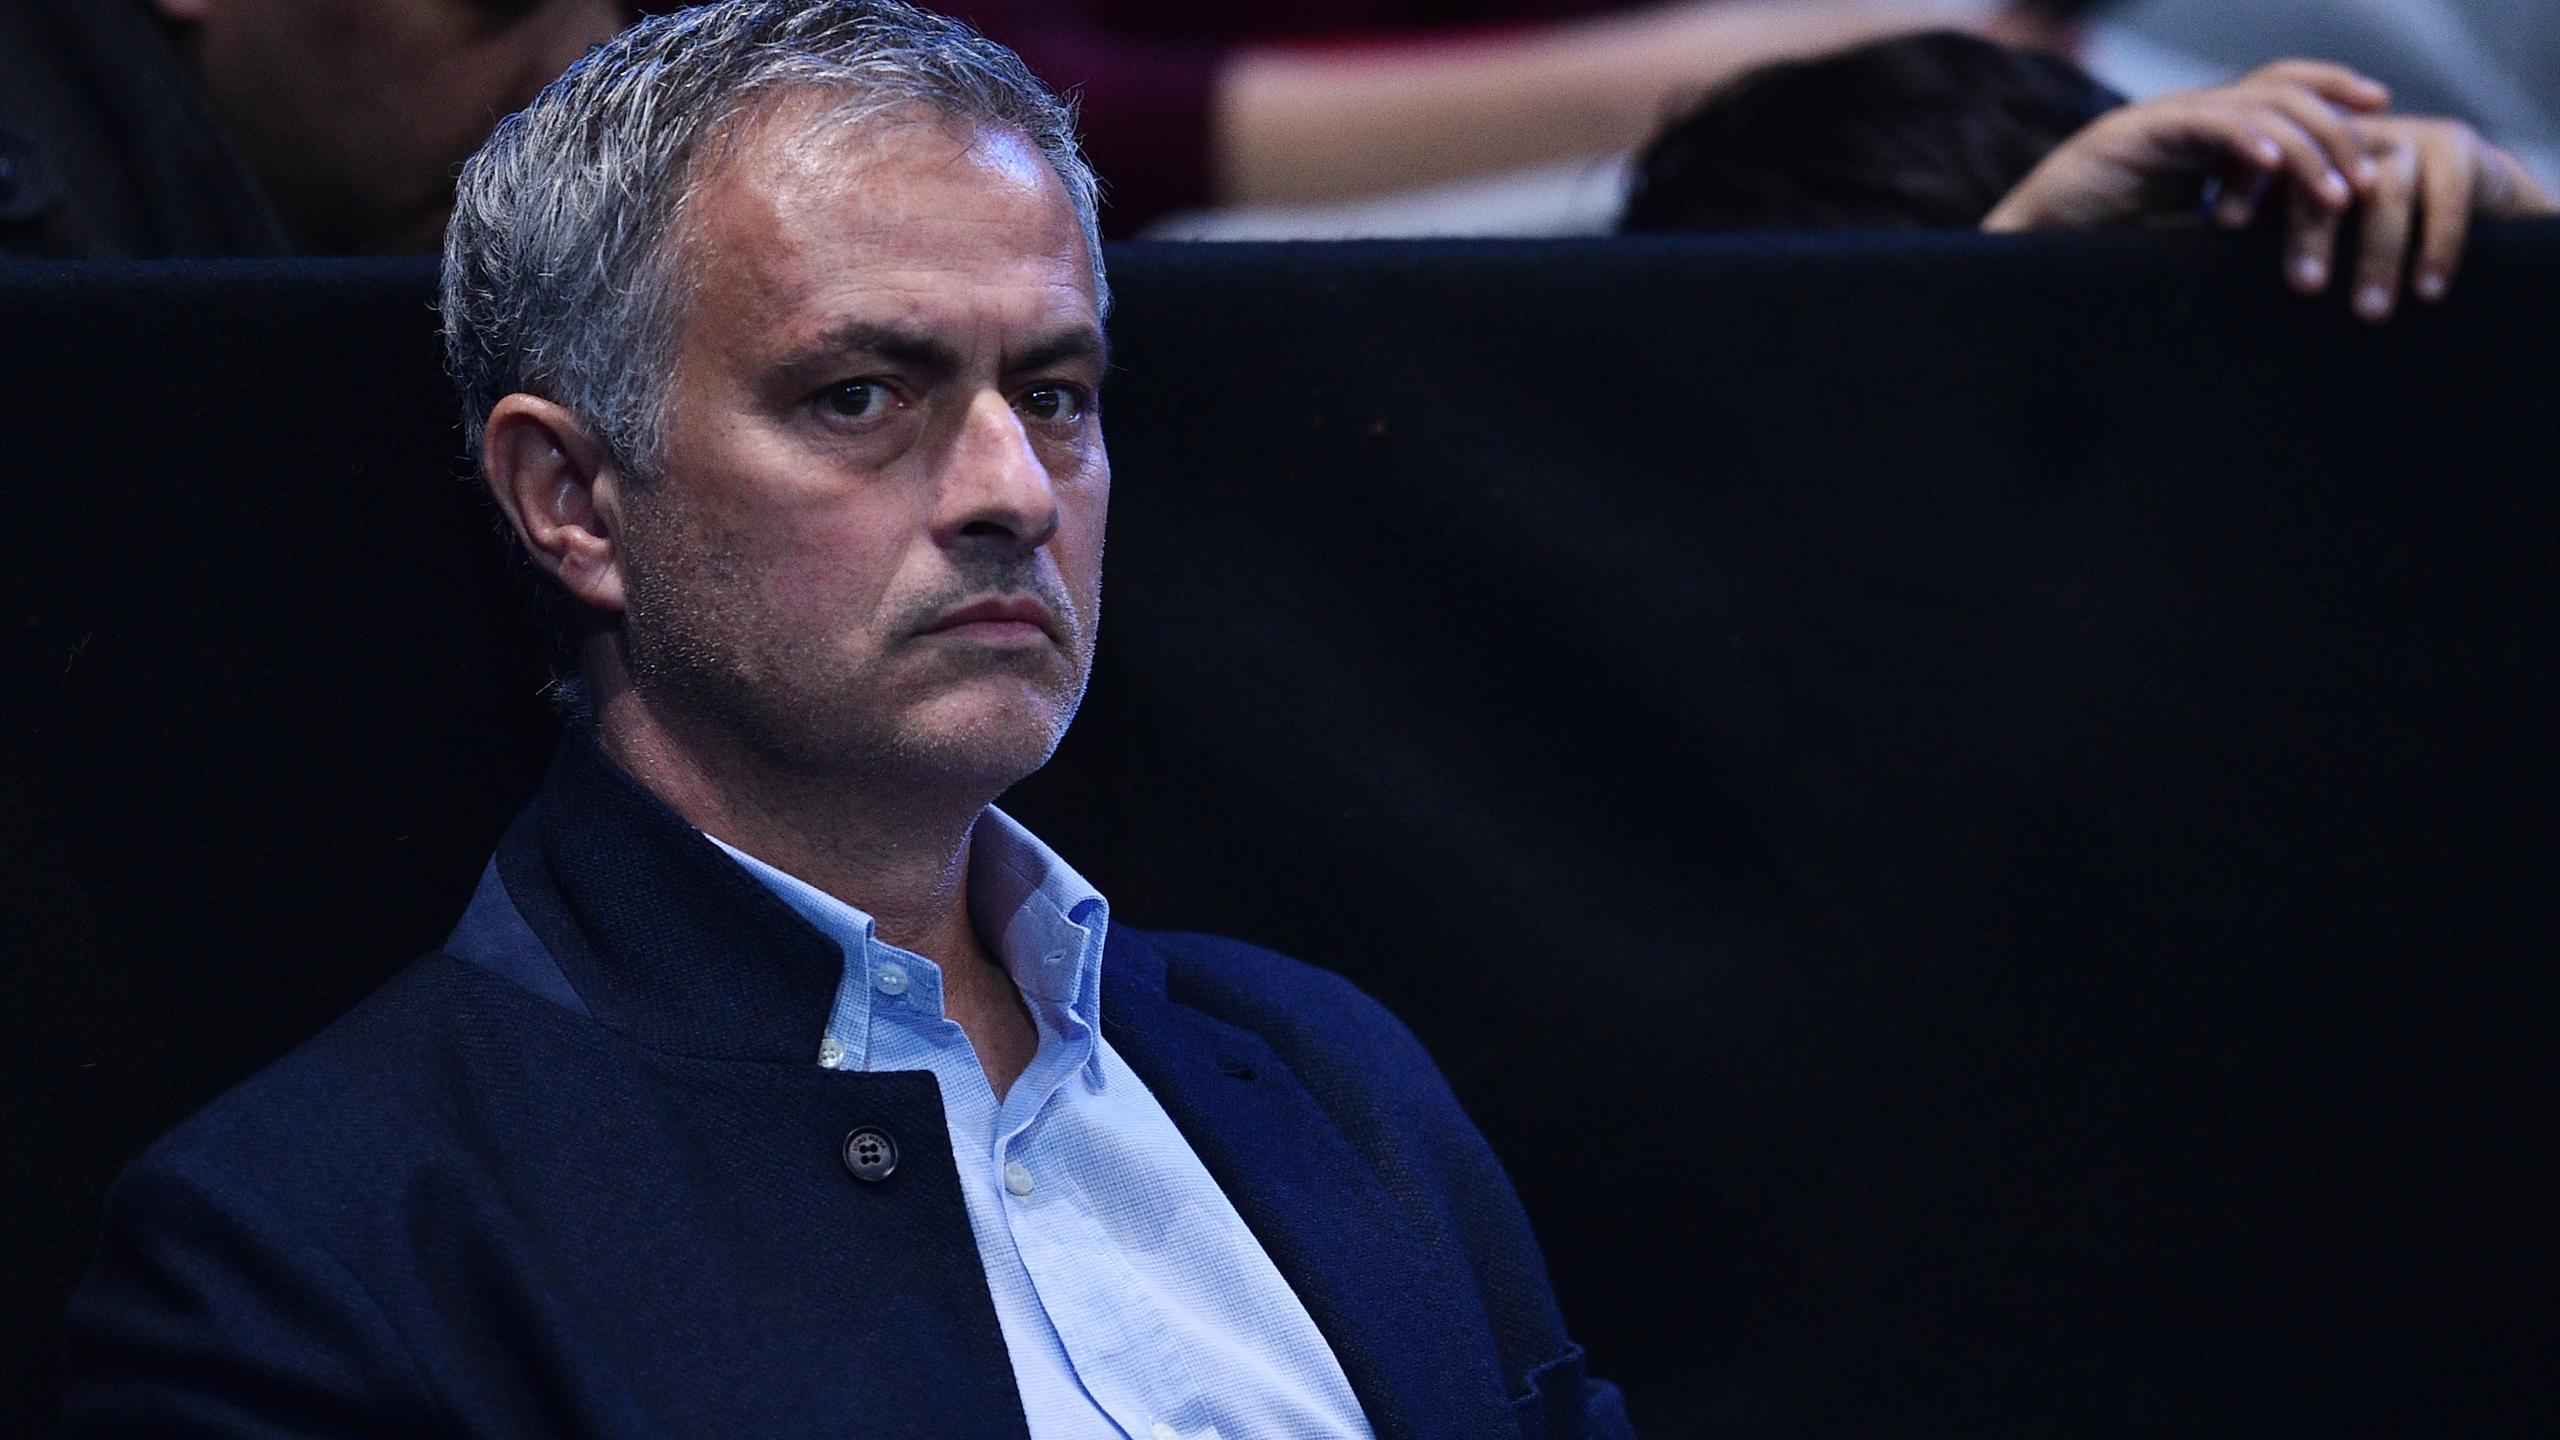 Manchester United coach Jose Mourinho watches Serbia's Novak Djokovic playing Austria's Dominic Thiem